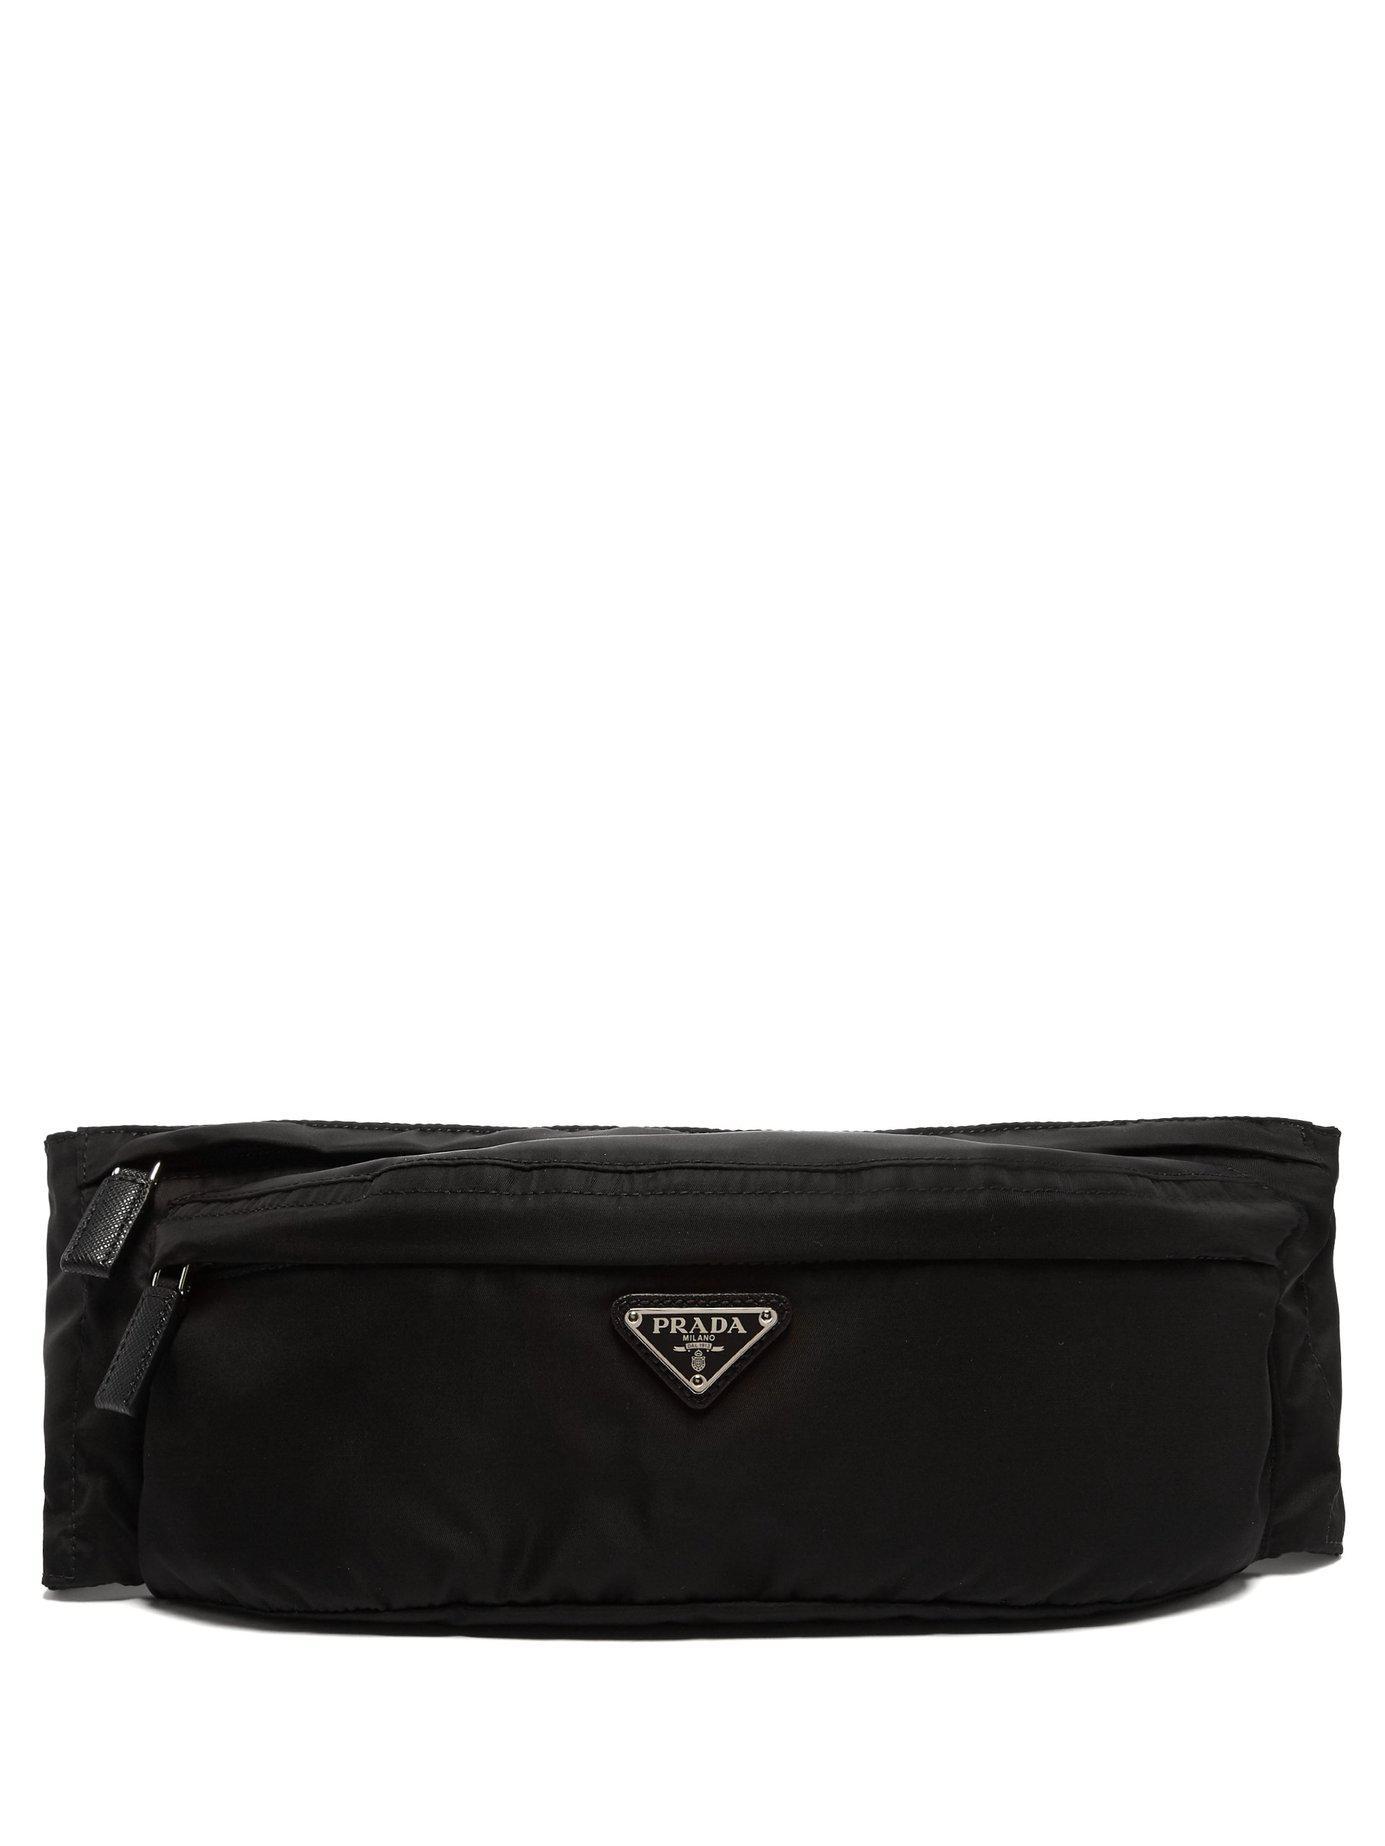 Lyst - Prada Black Nylon Belt Bag in Black for Men - Save 5% 9985a583858b9